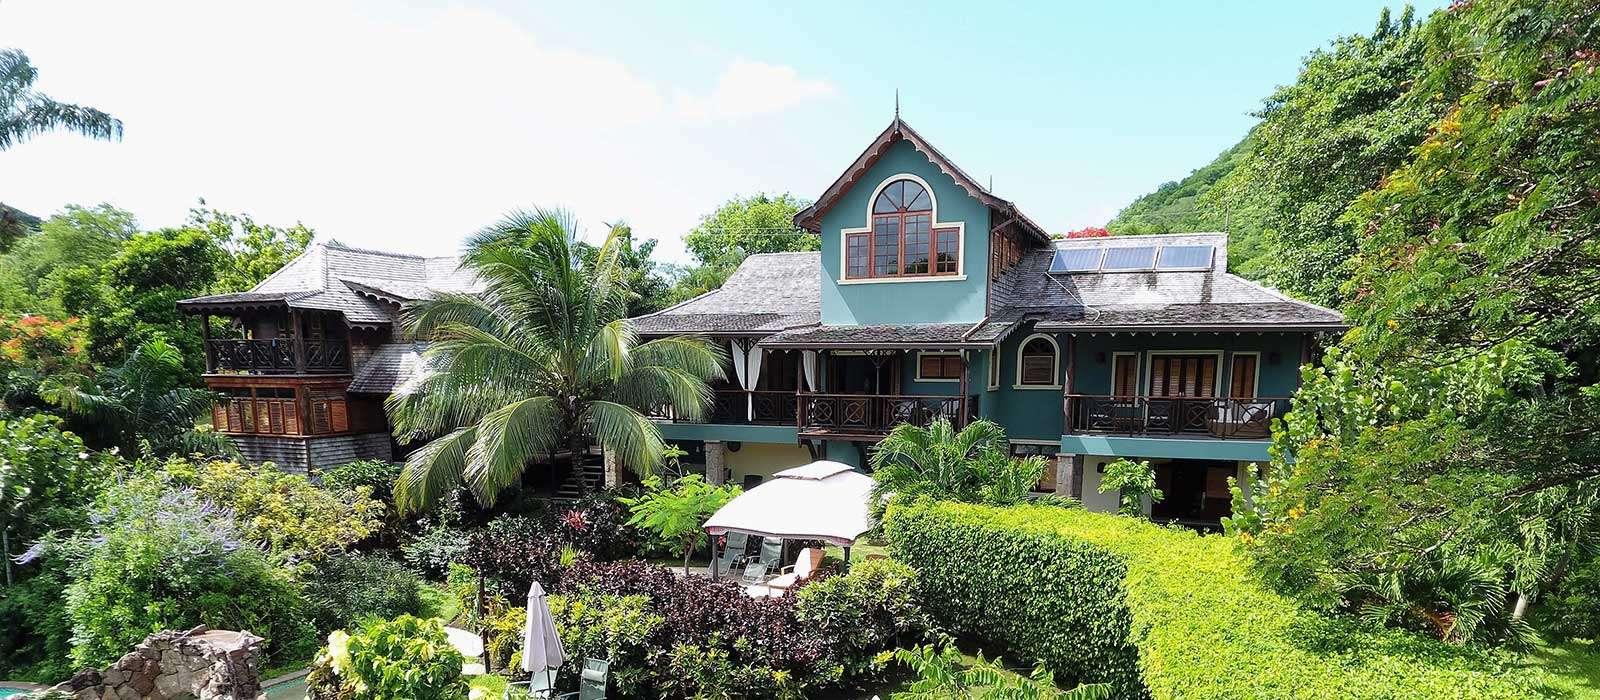 Luxury villa rentals caribbean - St lucia - Gros islet - Trouya - Villa C'est la Vie - Image 1/31